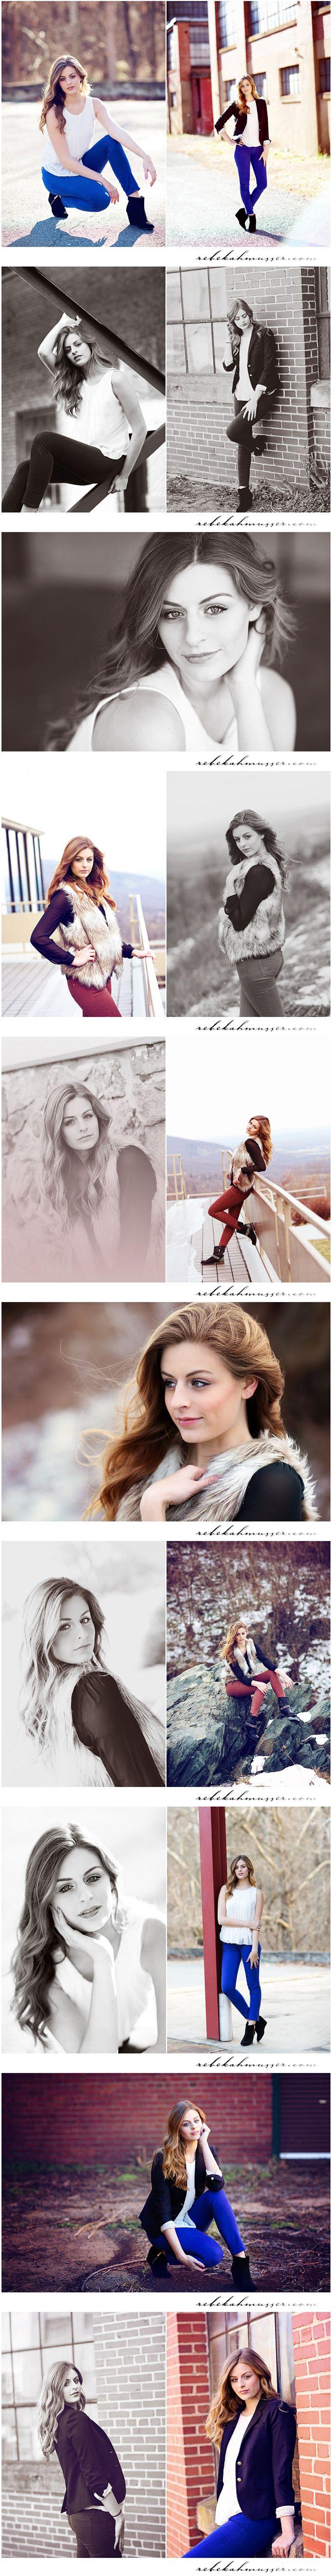 rebekahmusser.com https://www.facebook.com/pages/Rebekah-Musser-Photography/242799605787947